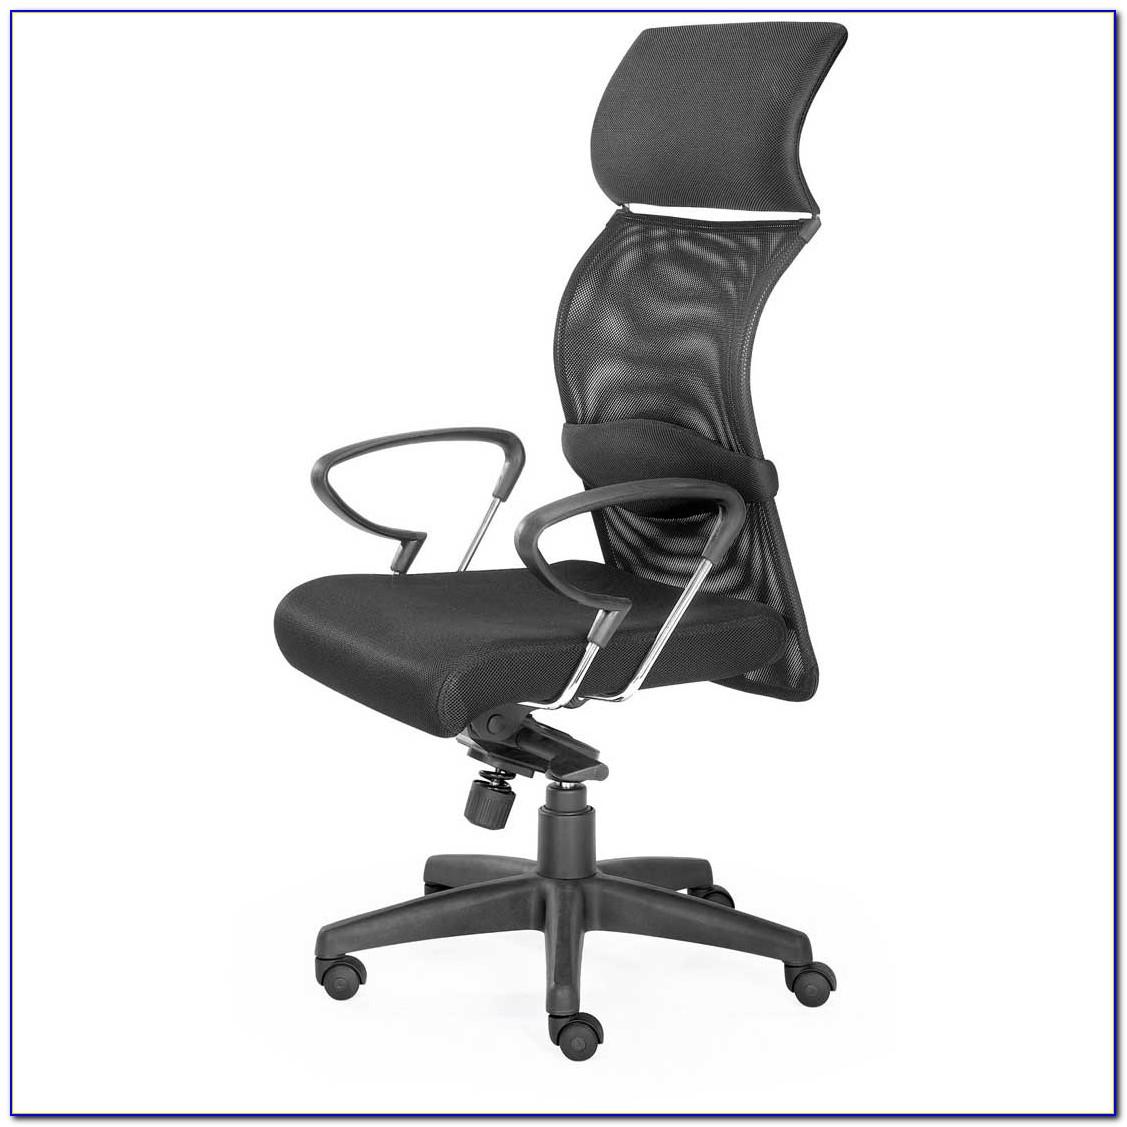 Diamond Ergonomic Office Desk Chair